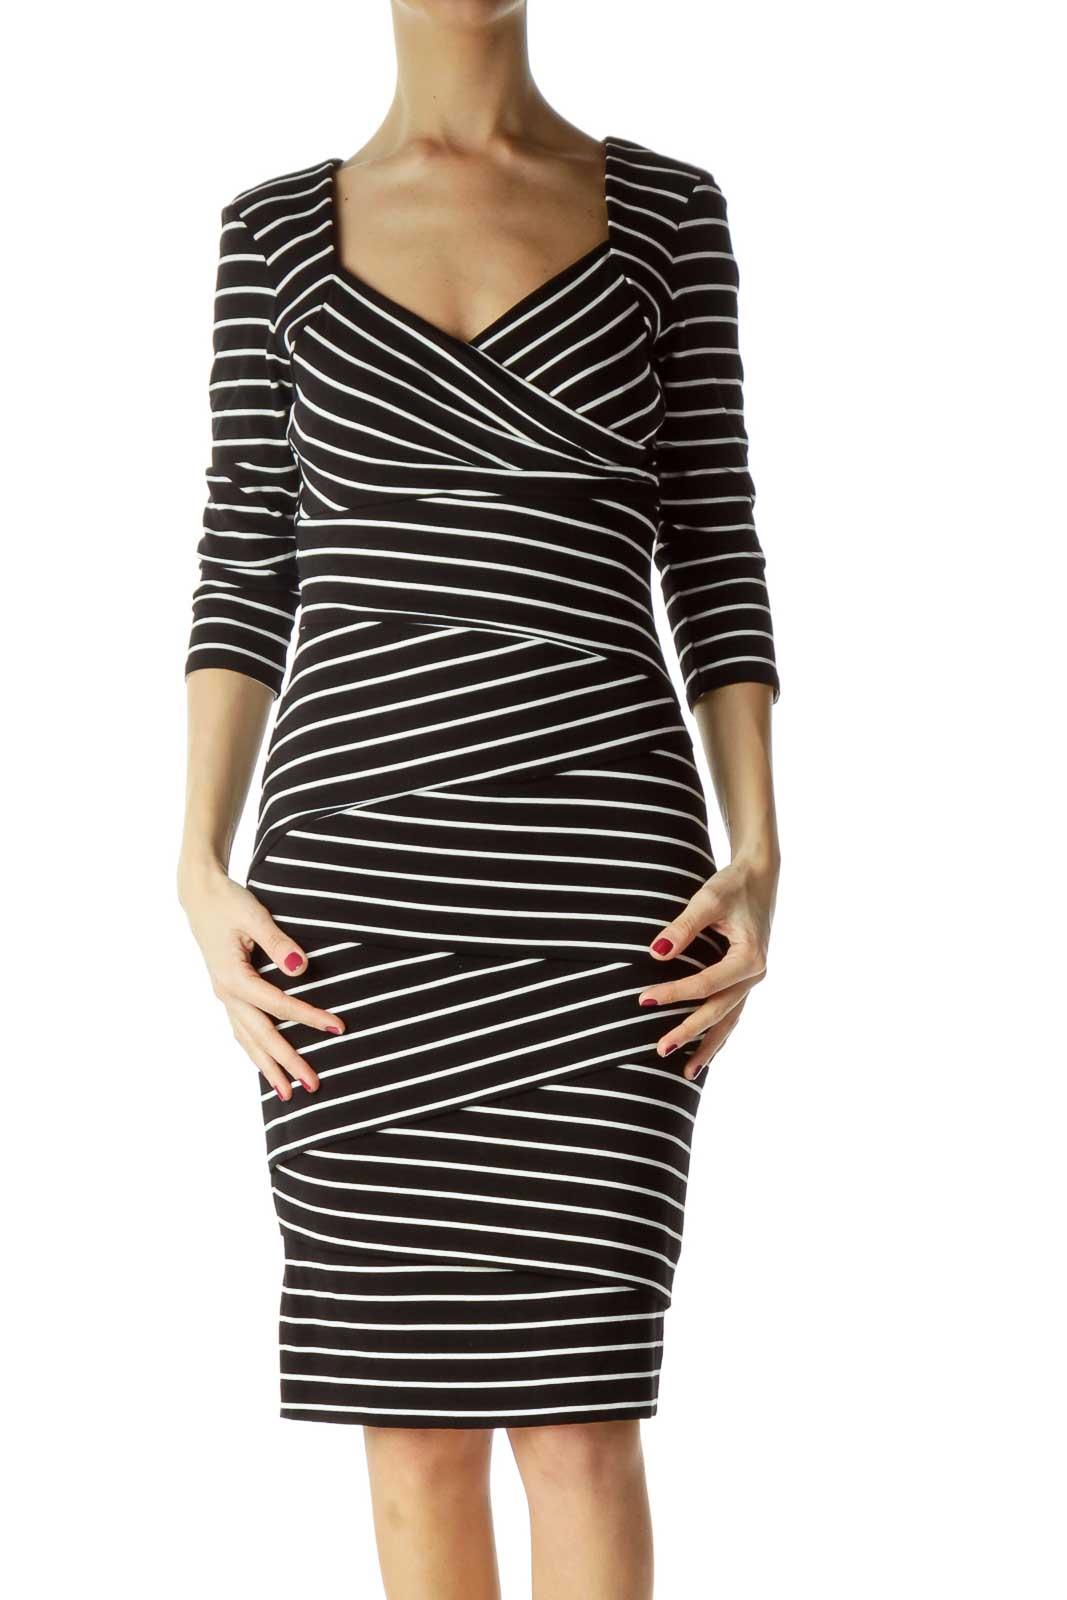 Black White Striped Long Sleeve Work Dress